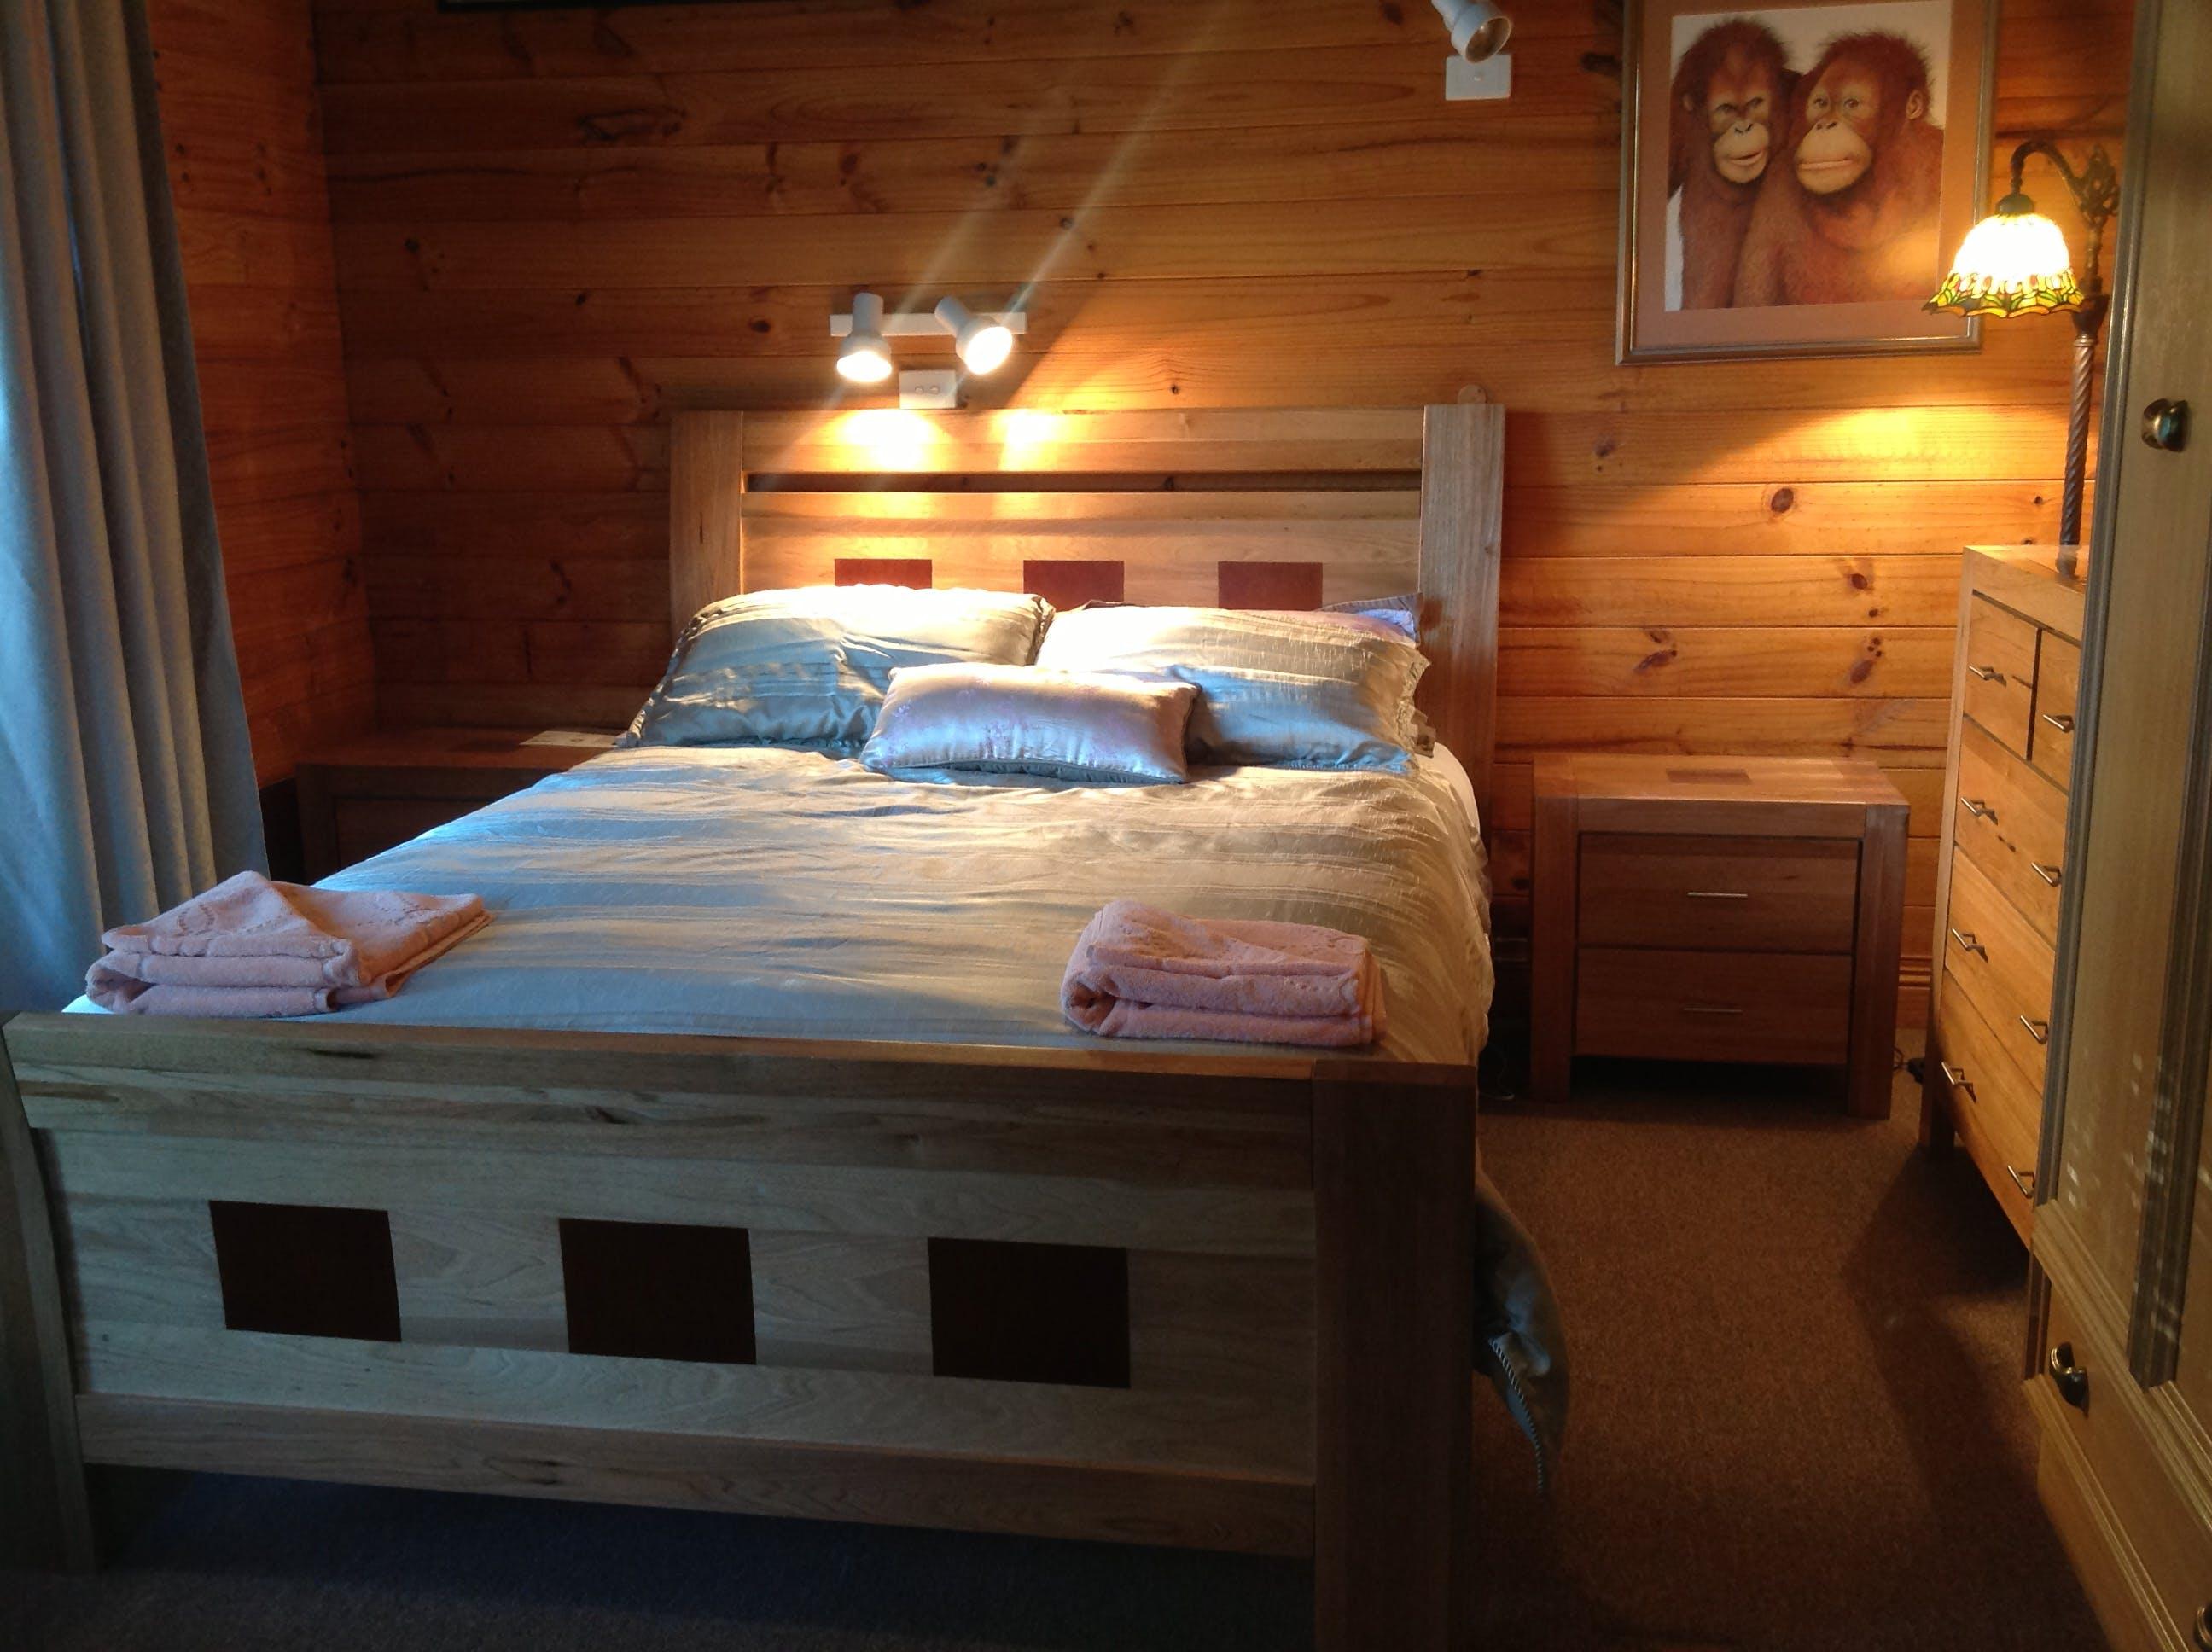 Aaa Granary Accommodation The Last Resort 2 Storey 2 Bedroom Cottage Aaa Granary Accommodation The Last